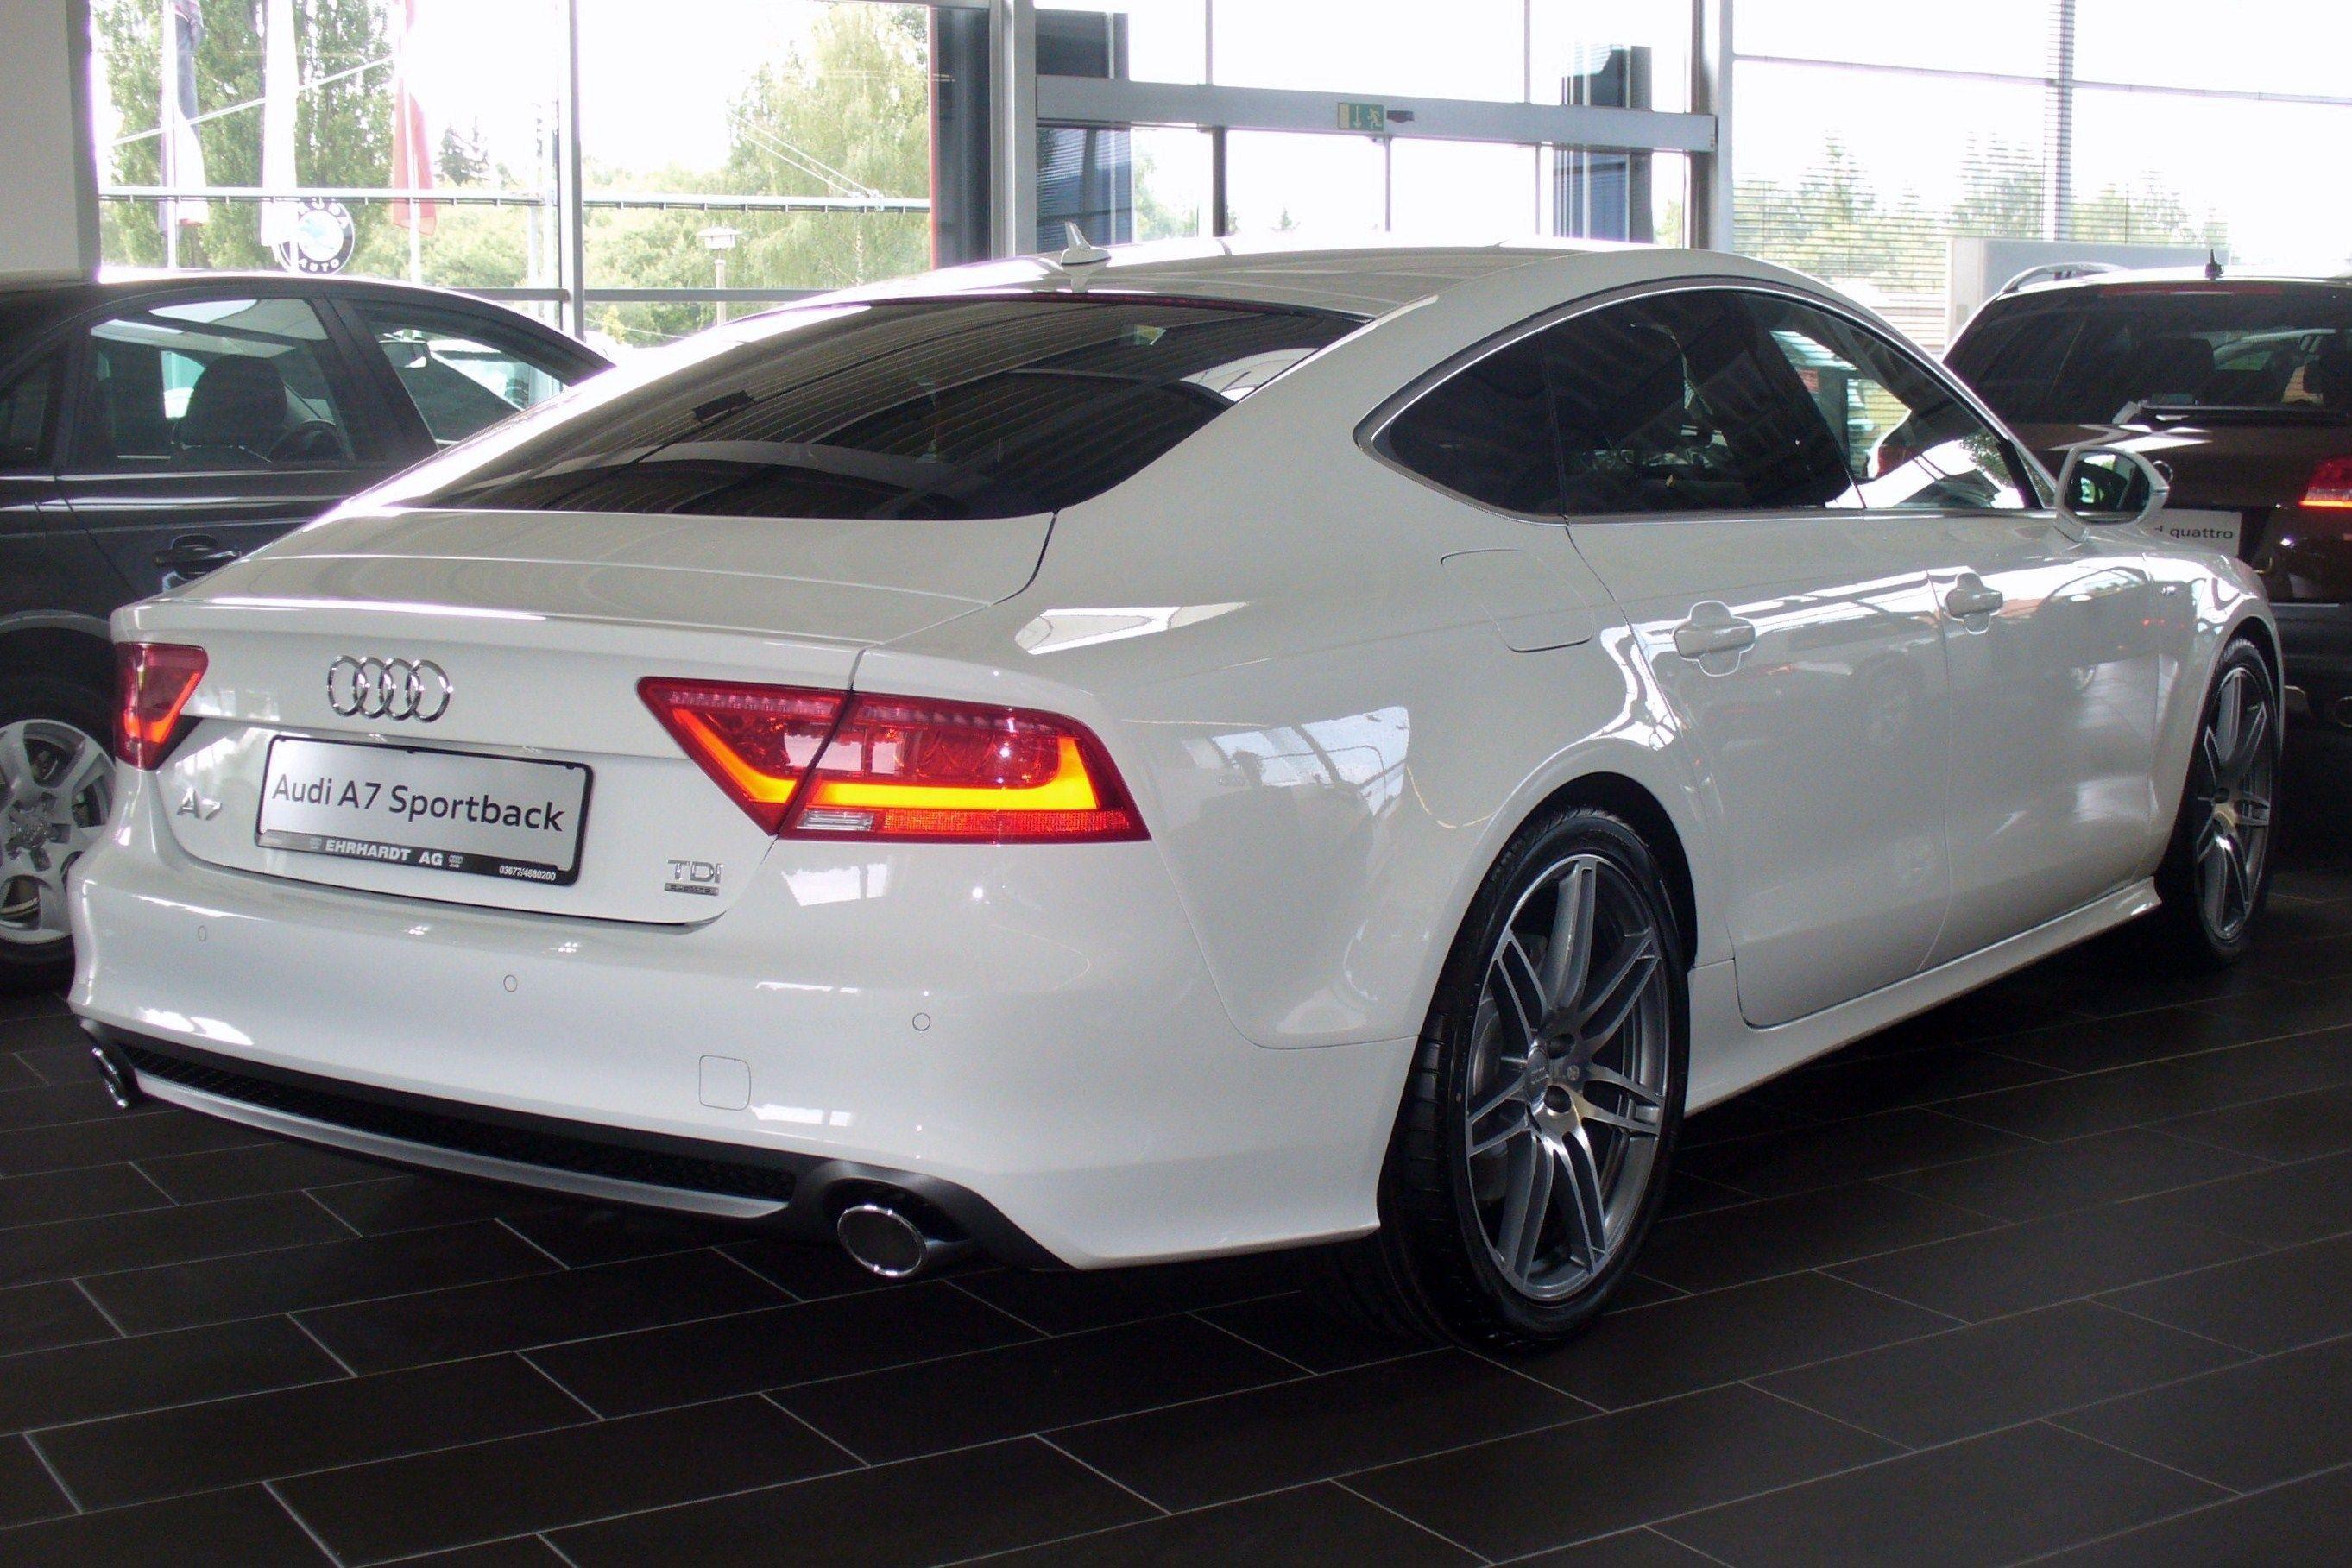 Audi Rs7 0-60 >> Audi Rs7 0 60 Car Audi A7 Audi Rs7 Dan Audi A7 Sportback